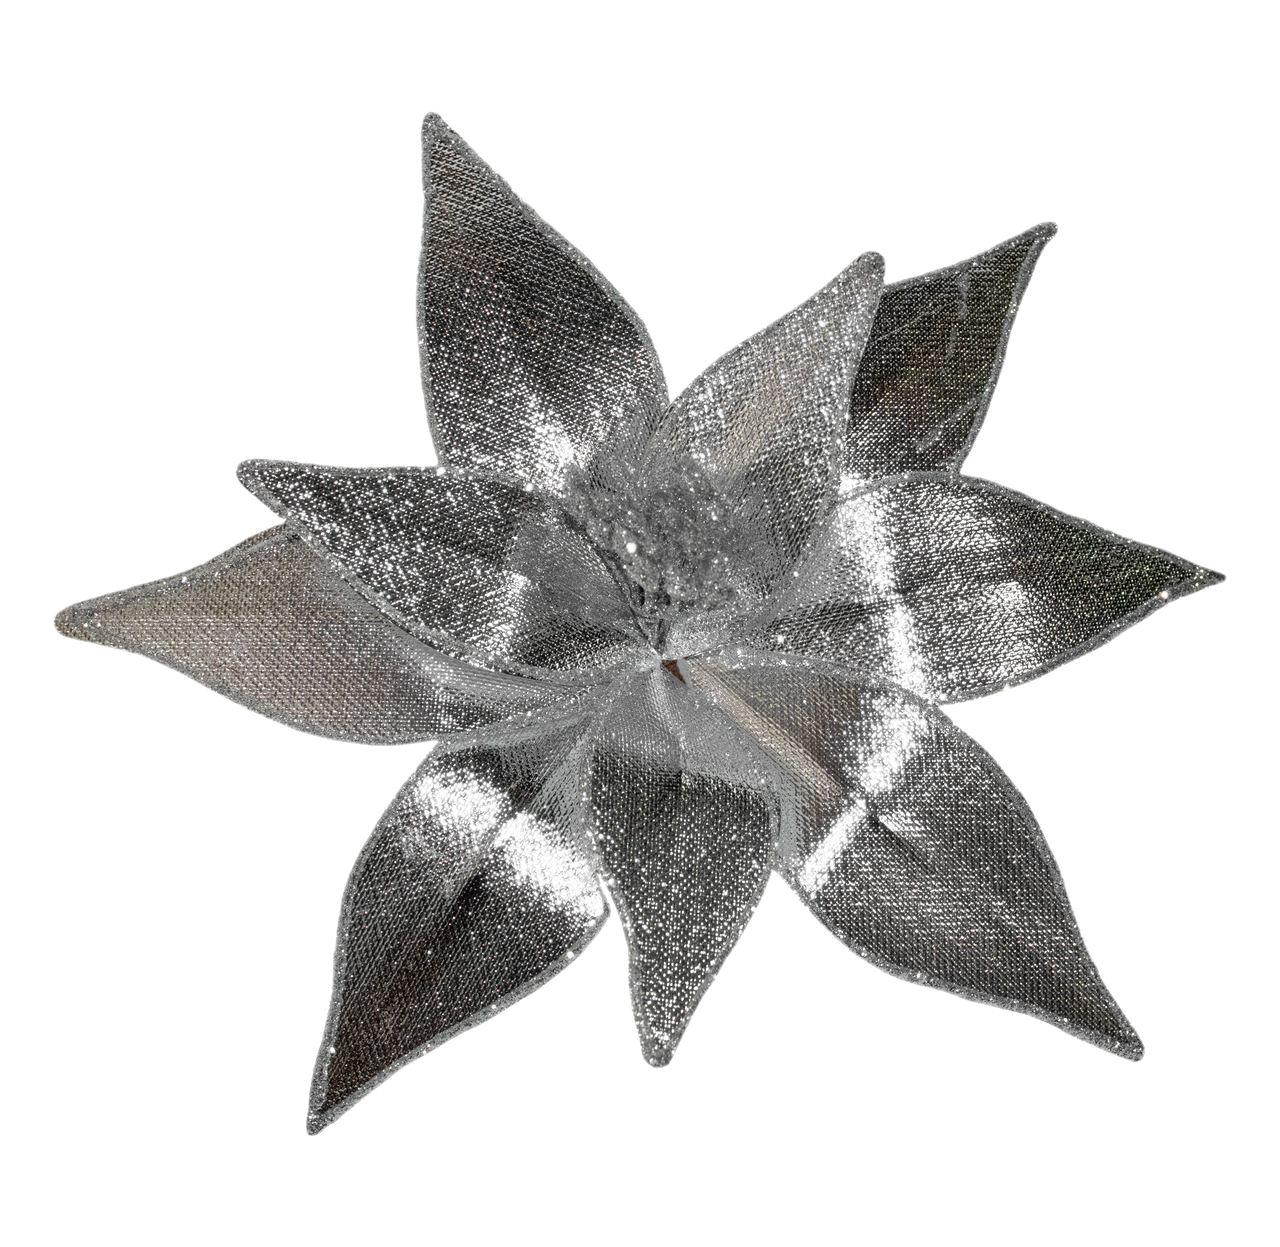 Flor Bico De Papagaio De Prata - 25 Cm